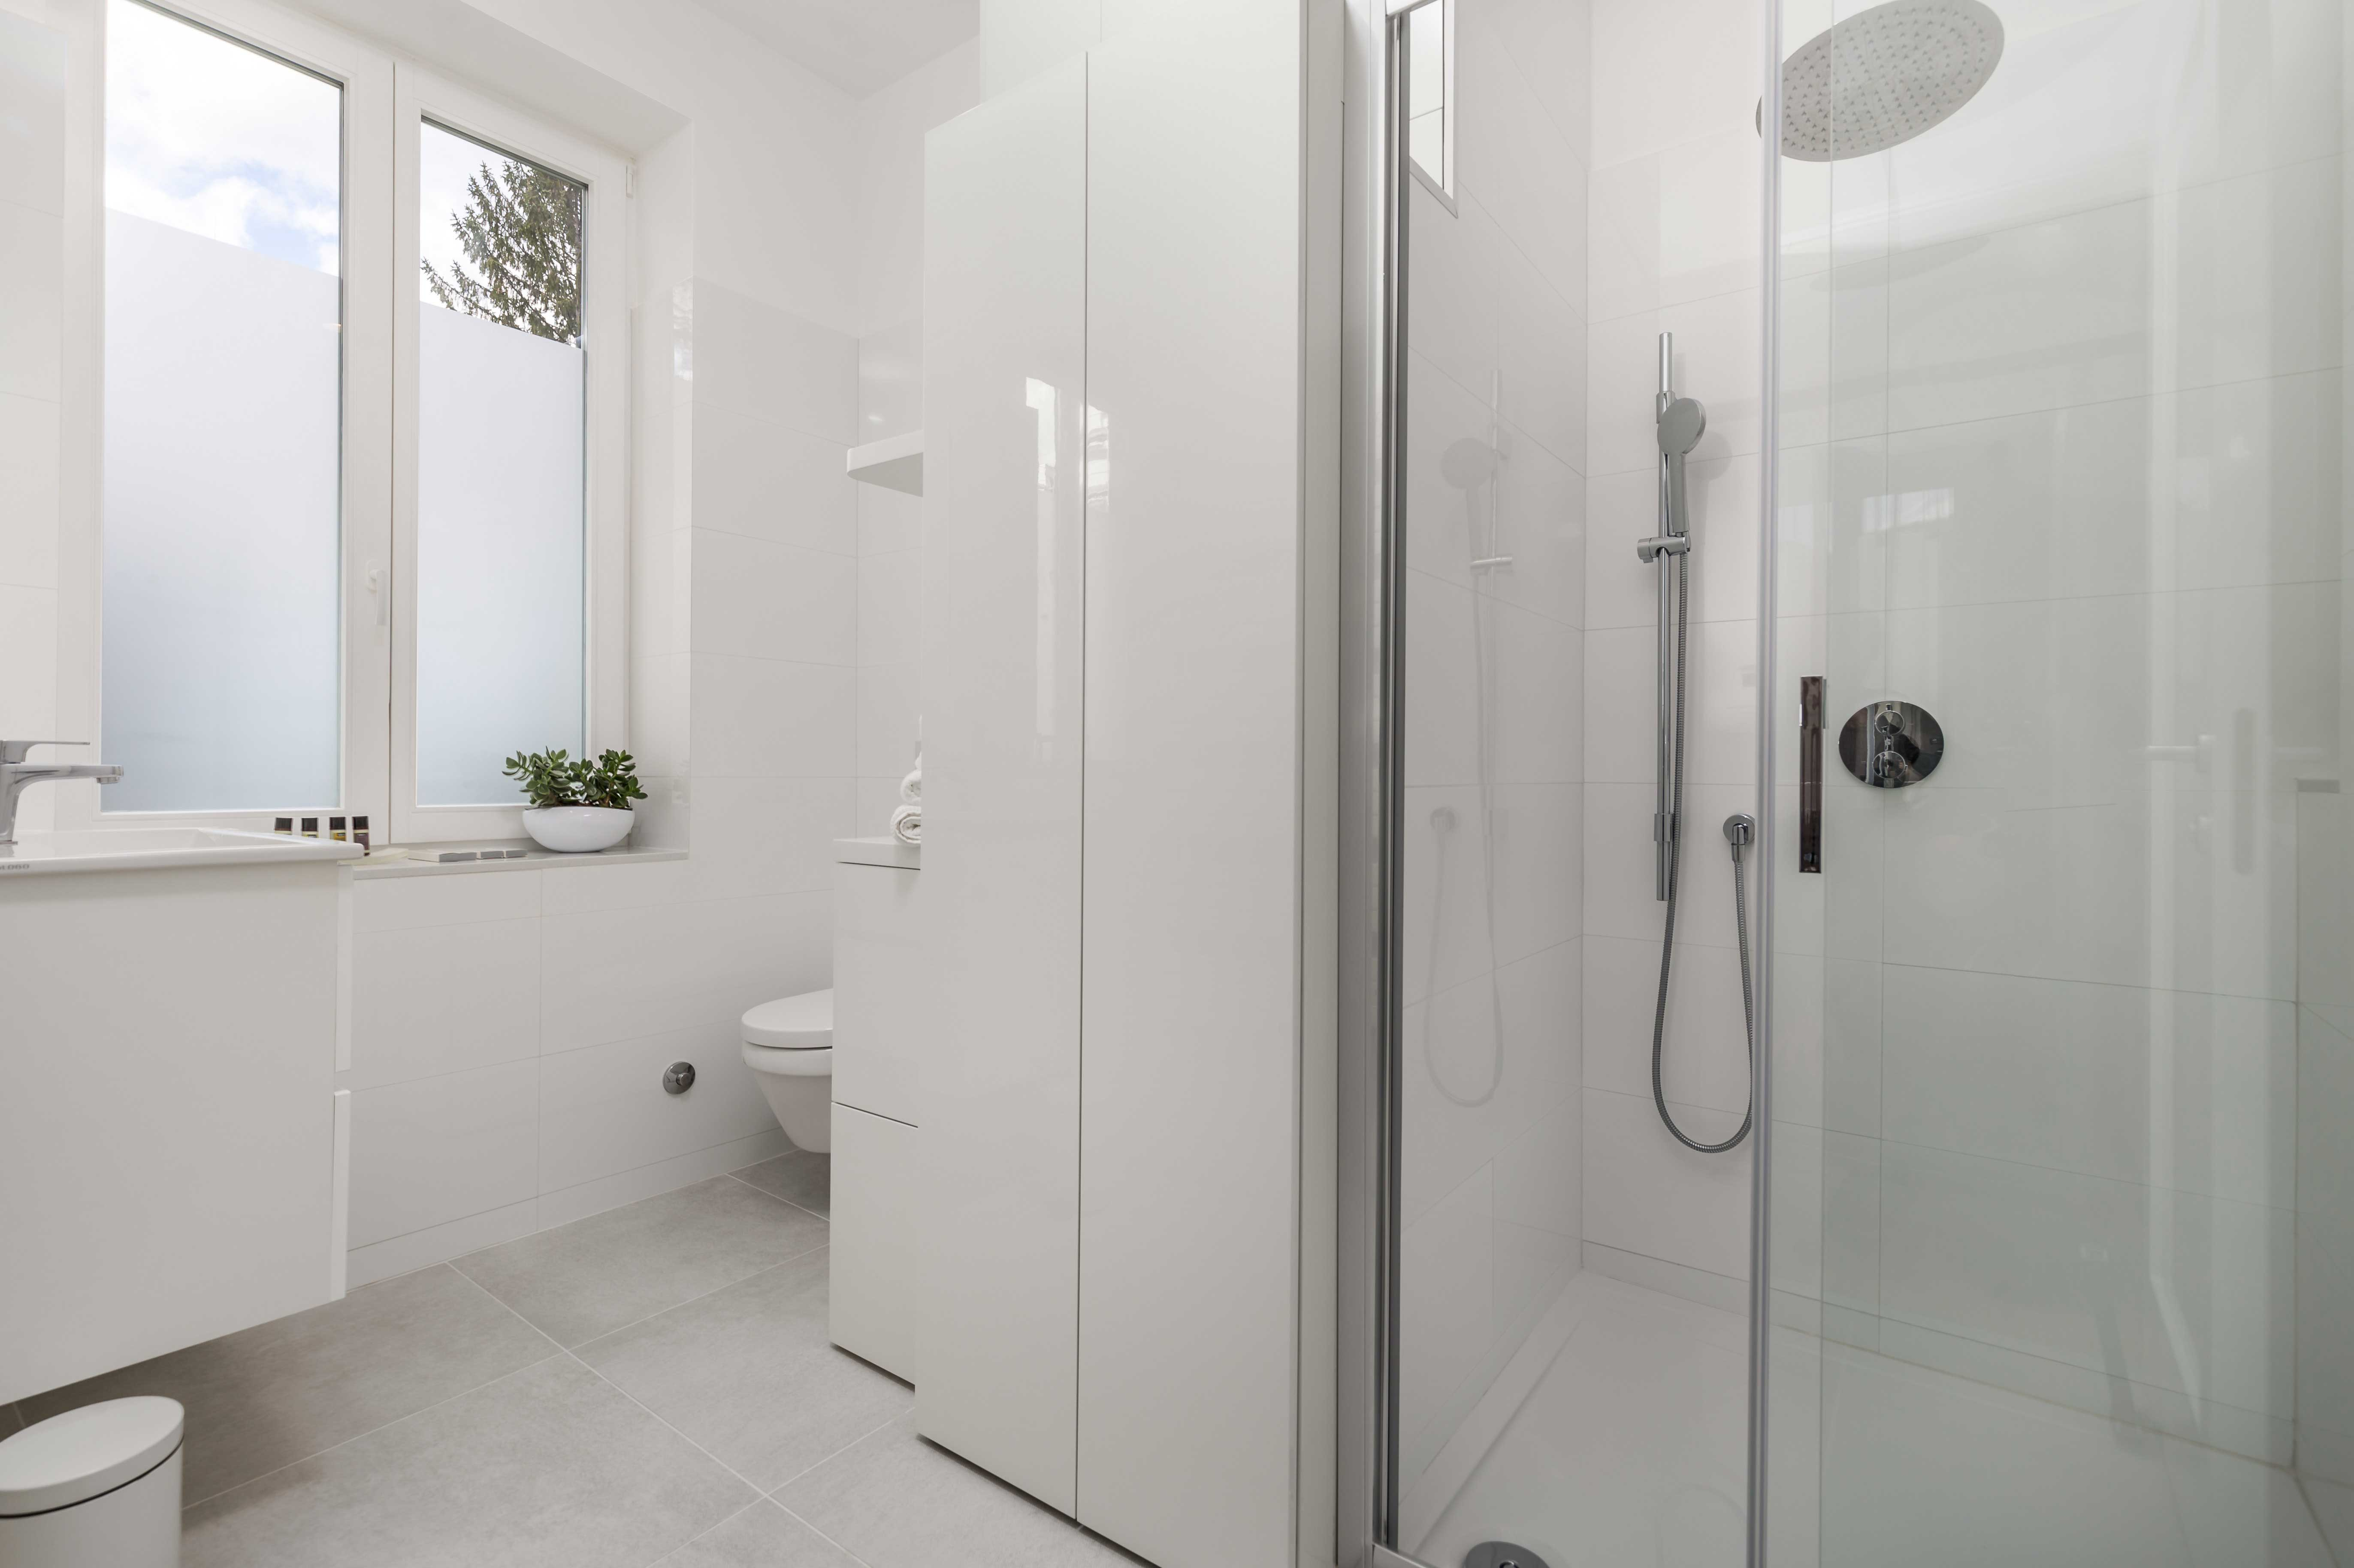 kupaonica, apartman OLA, oaptija, luksuzni apartman